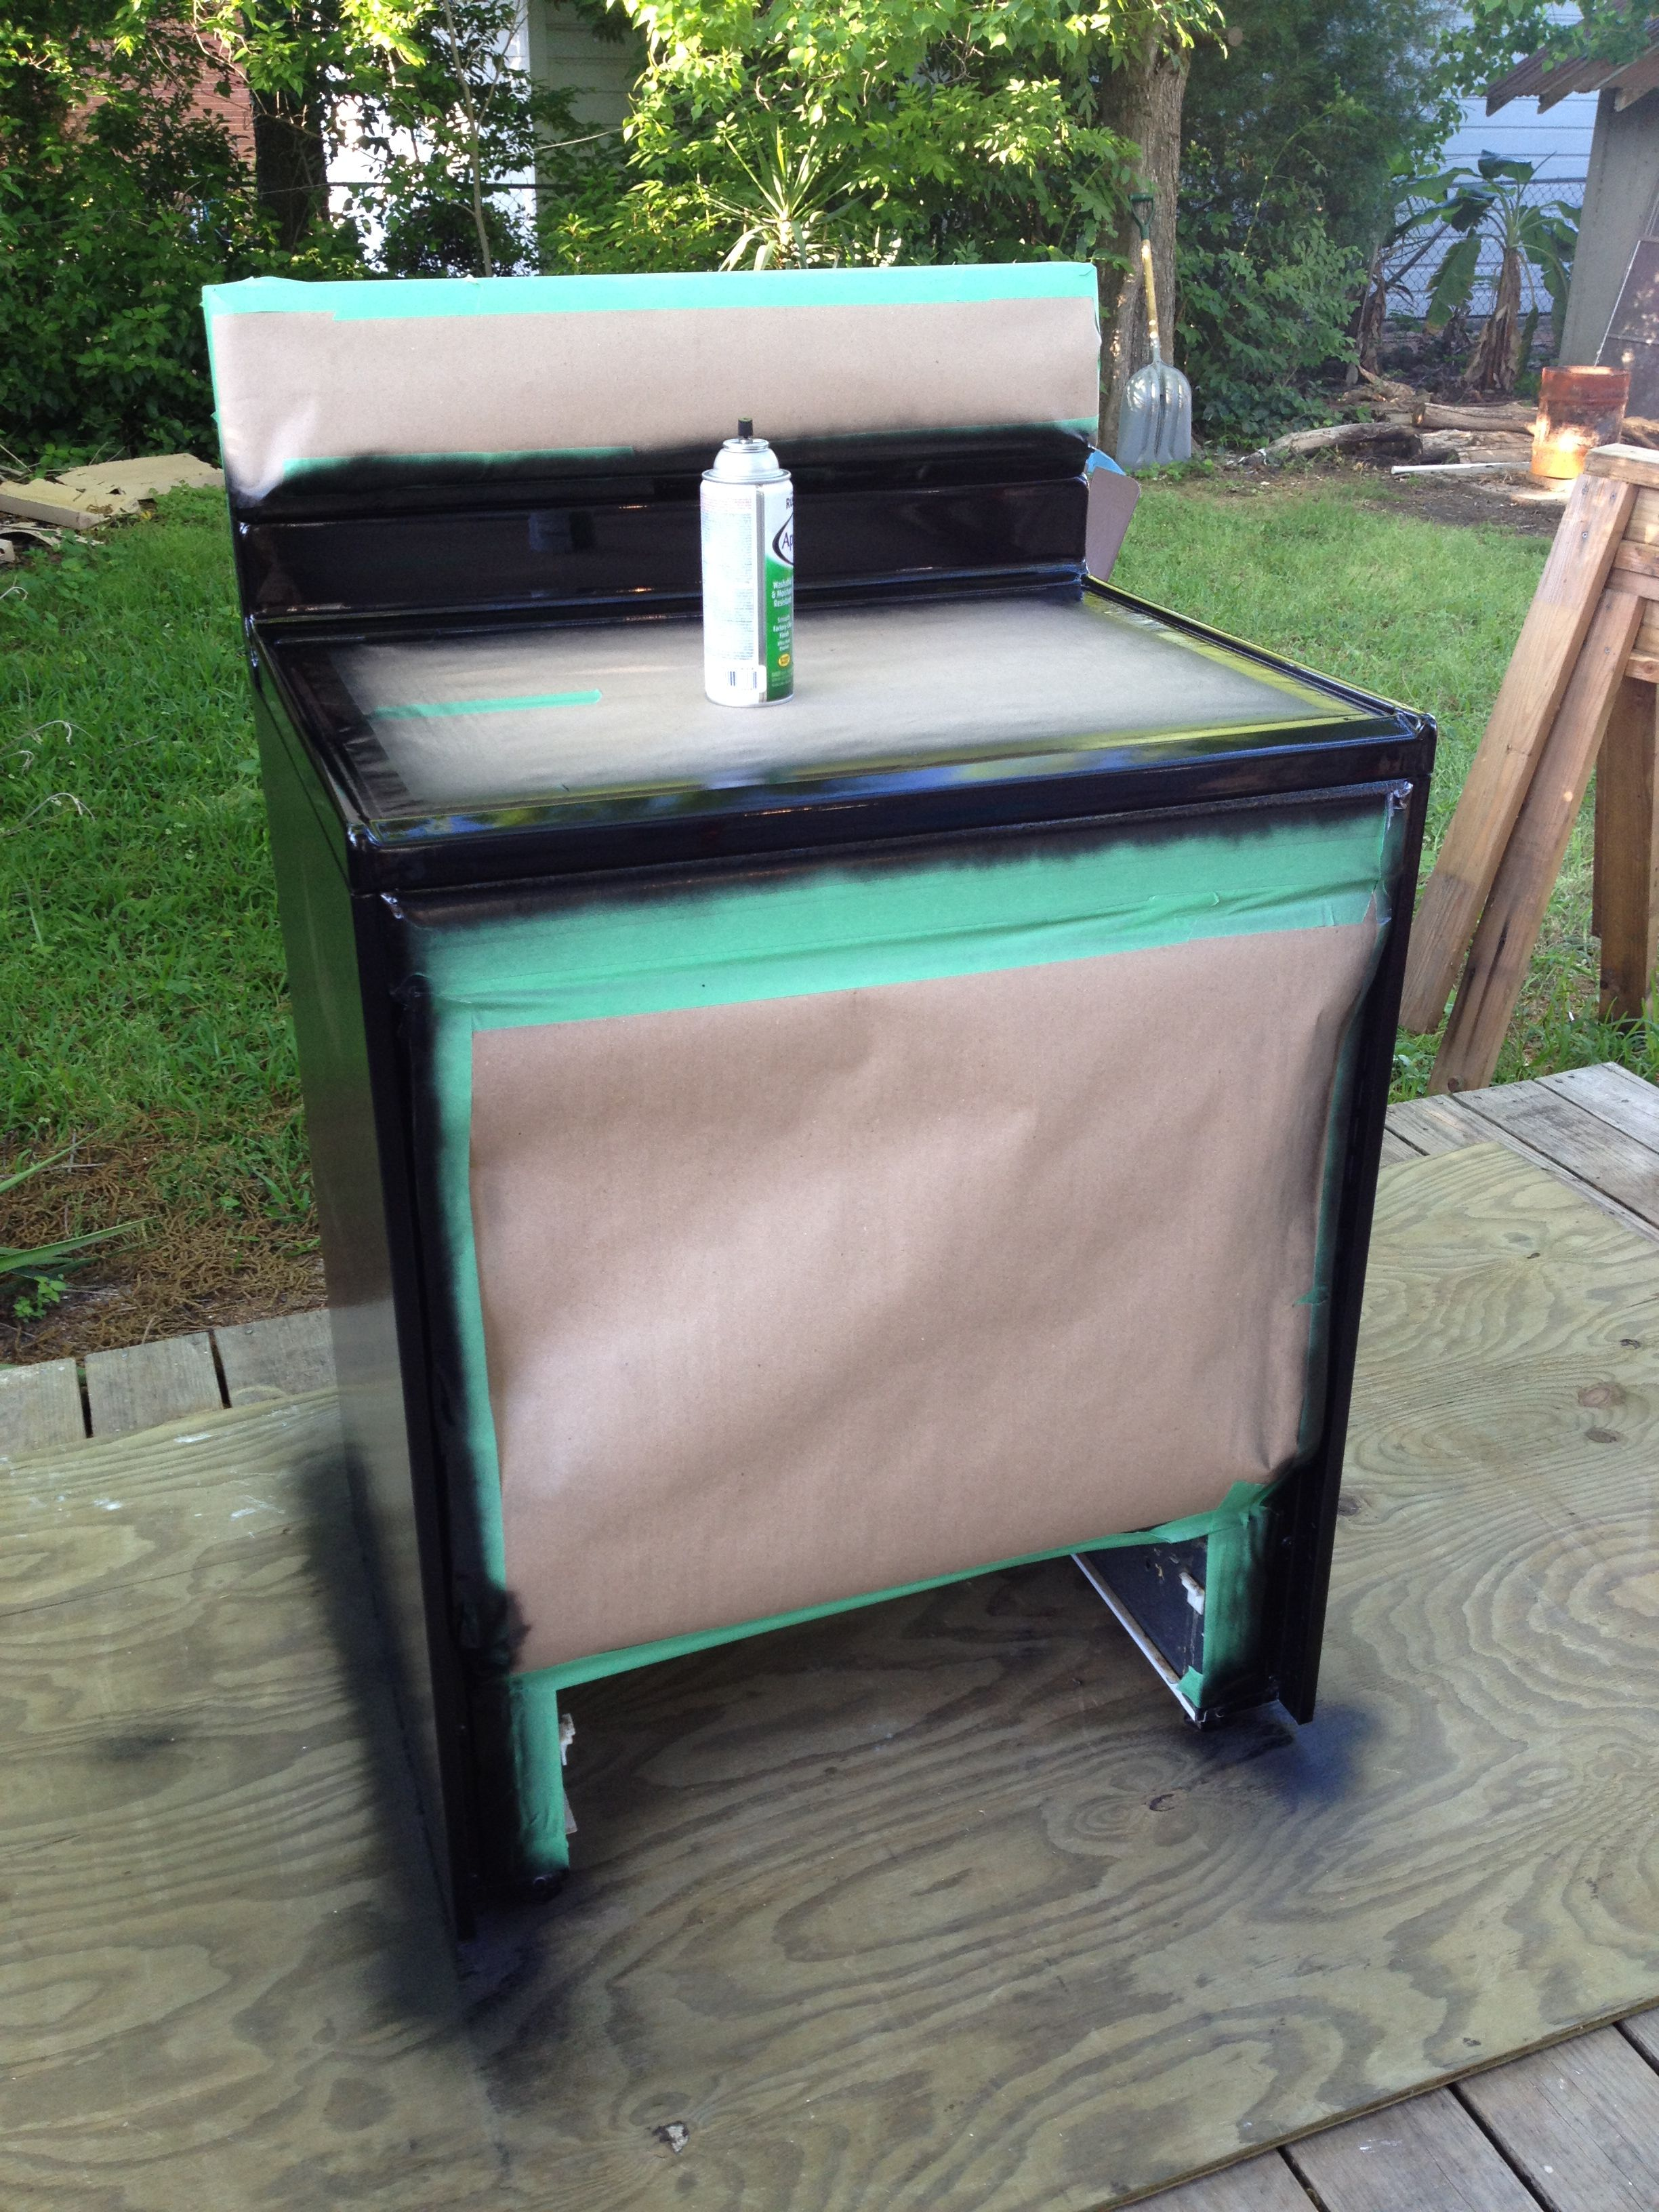 Painting The Zebra Stove  Paint Is Metallic Appliance Spray